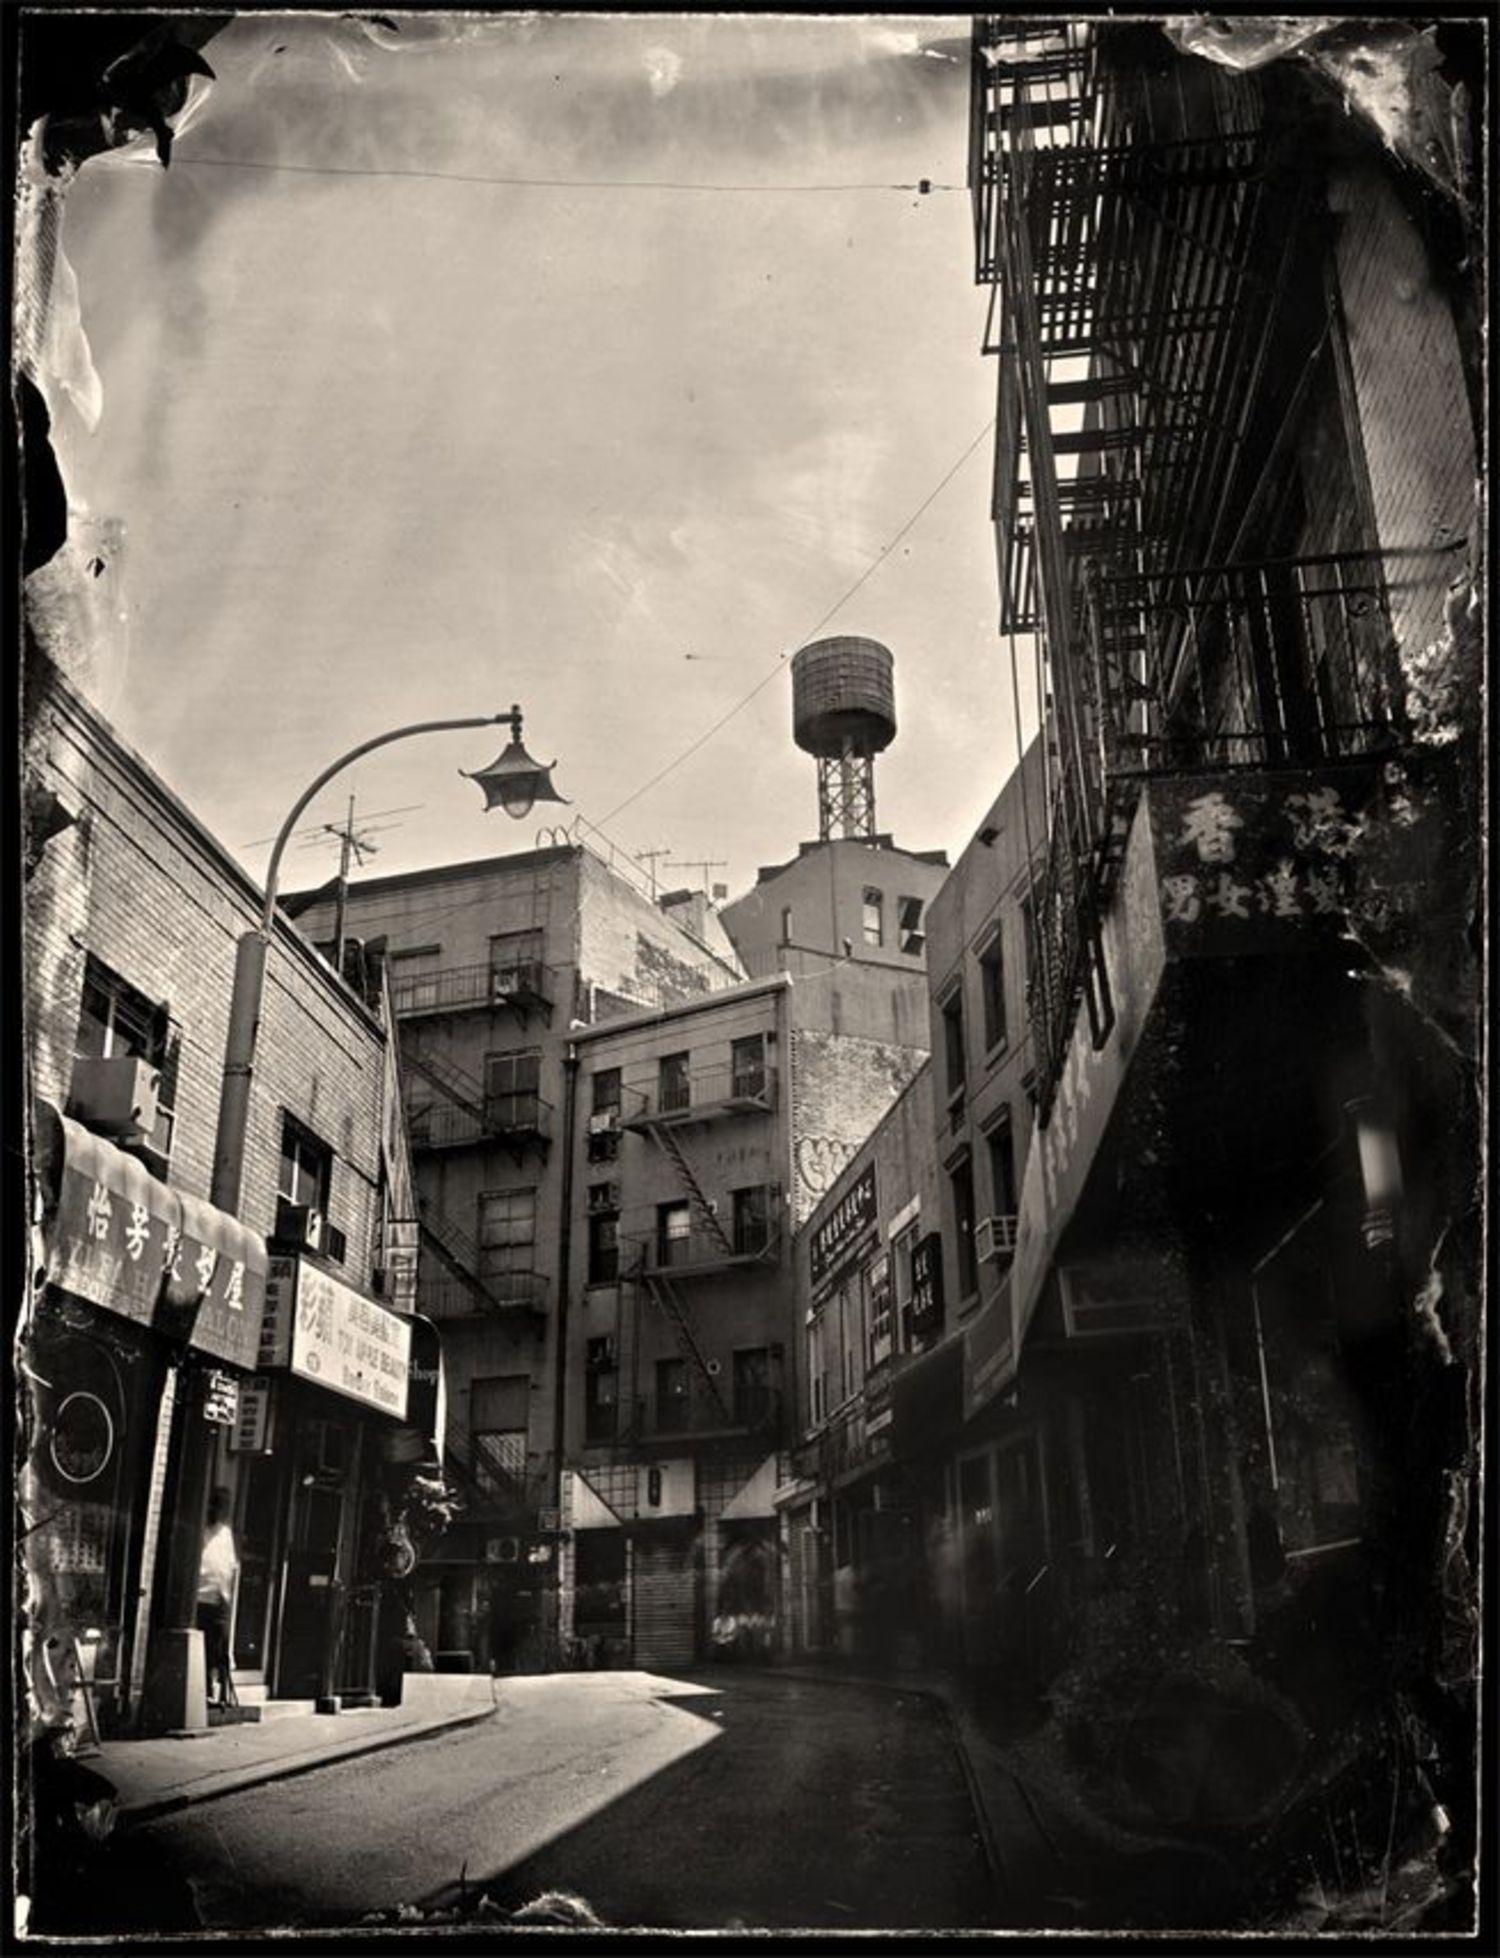 Bloody Angle, Chinatown, NYC, 2014